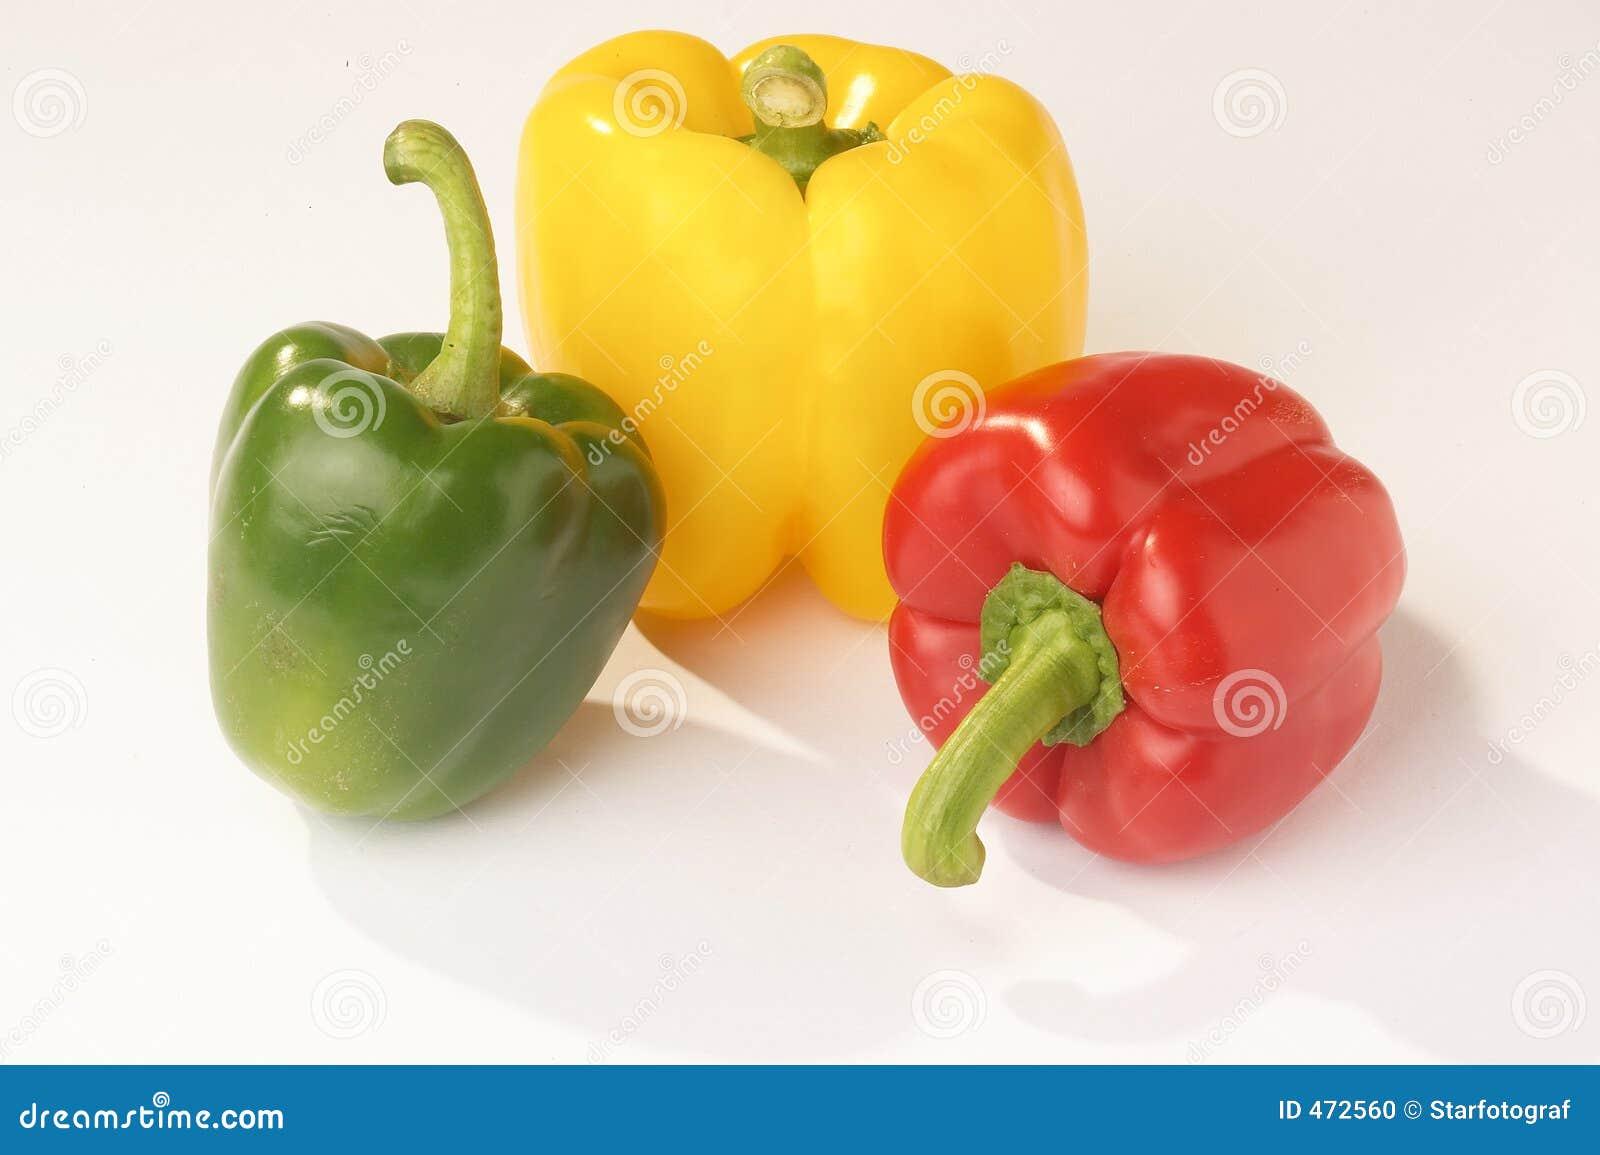 Pepper - Paprika